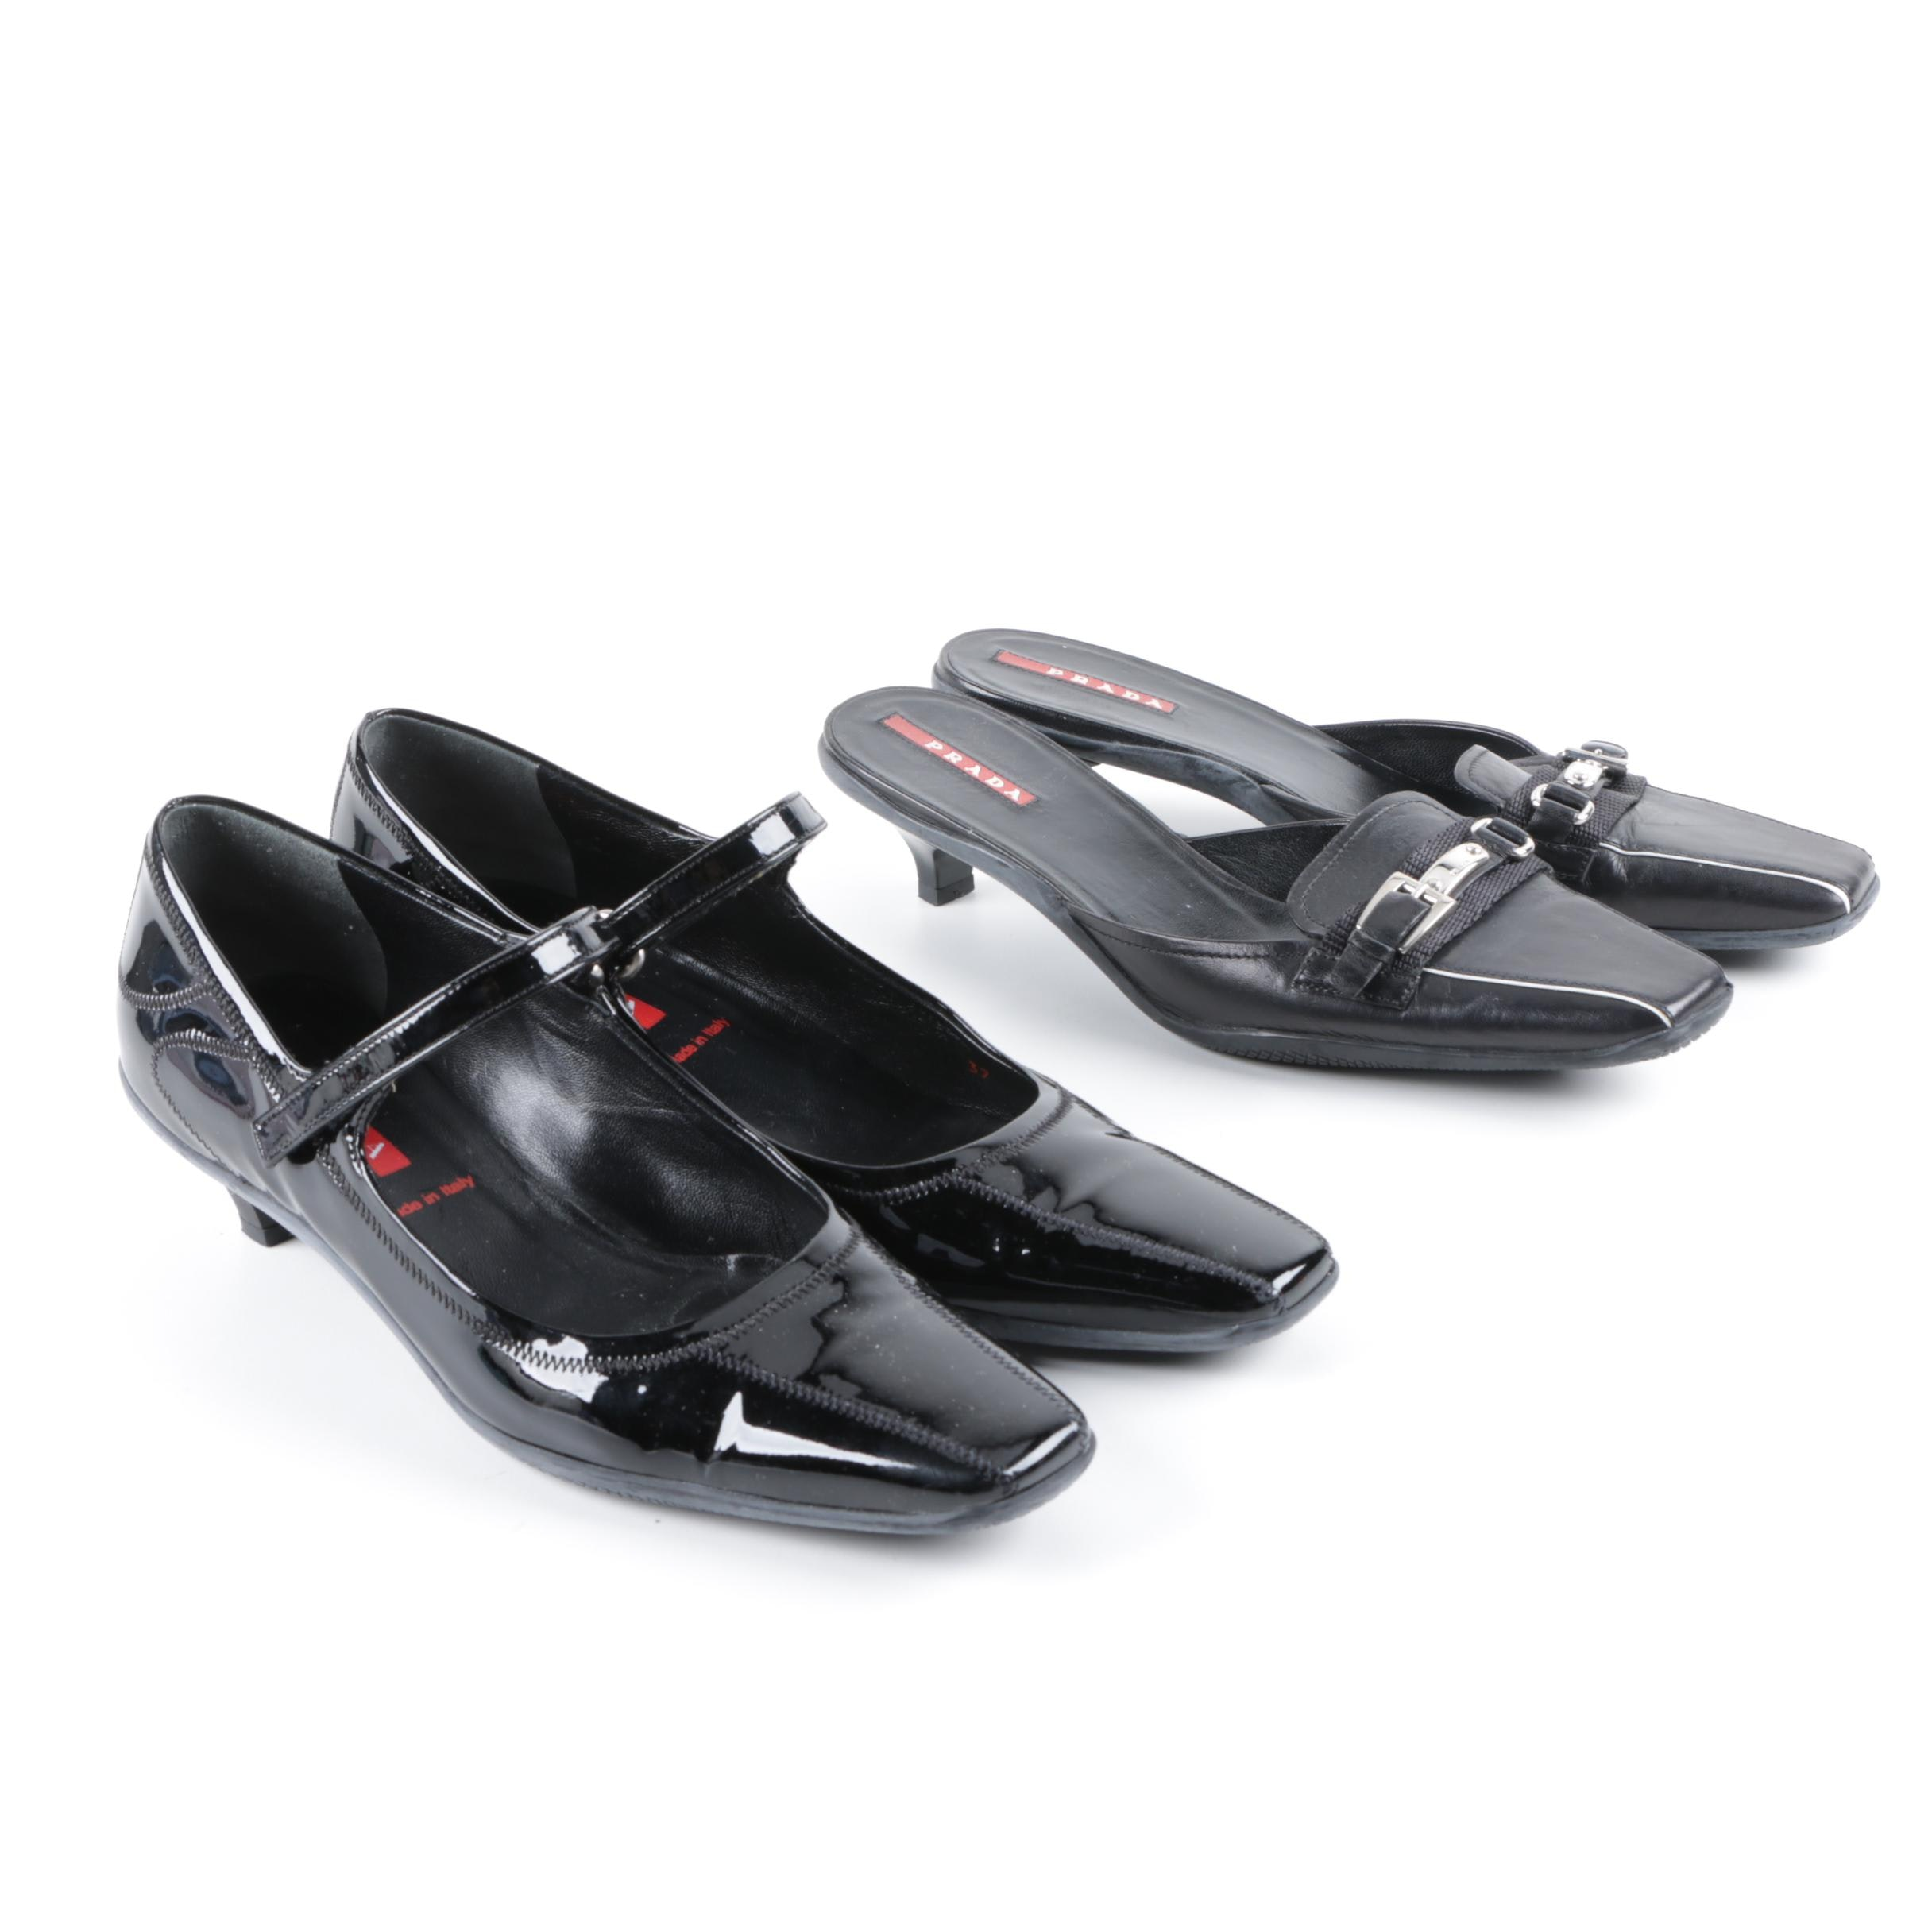 Prada Black Leather Kitten Heel Mules and Mary Janes